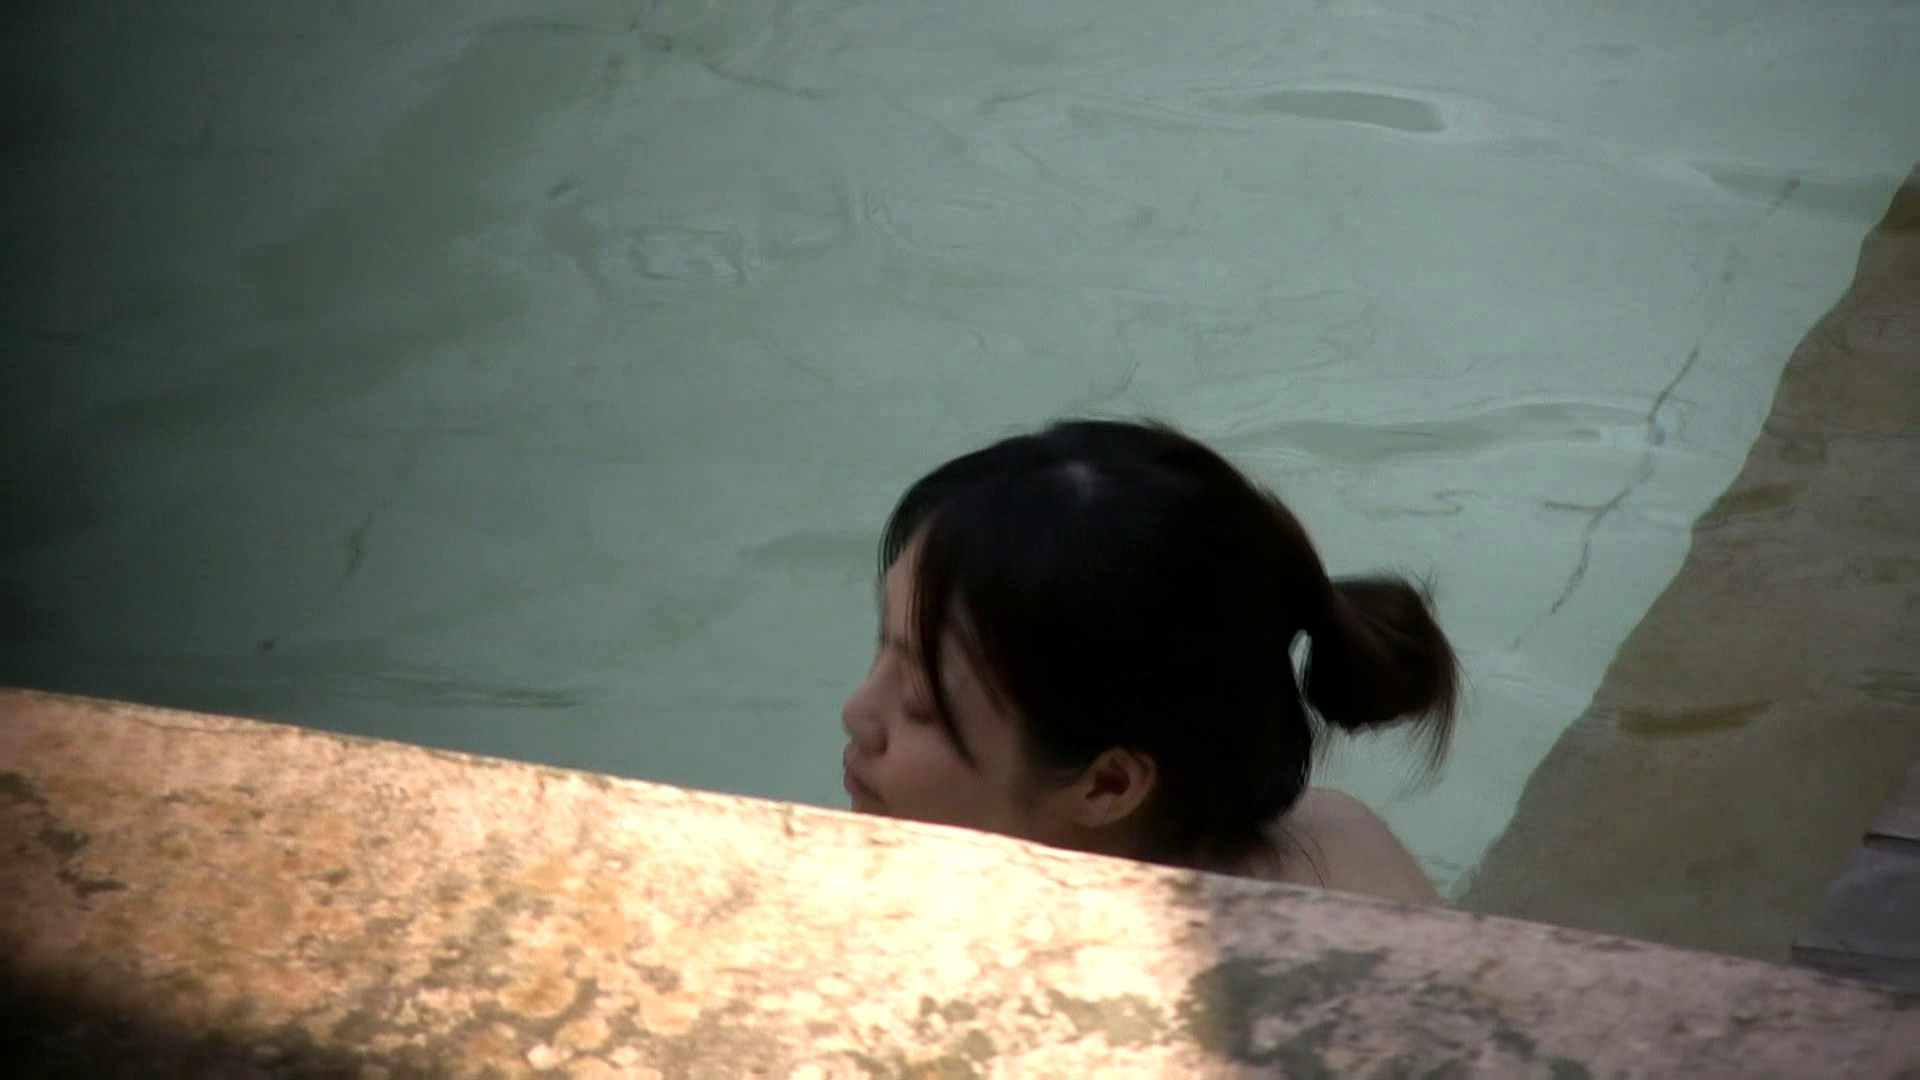 Aquaな露天風呂Vol.652 盗撮 | HなOL  105pic 7